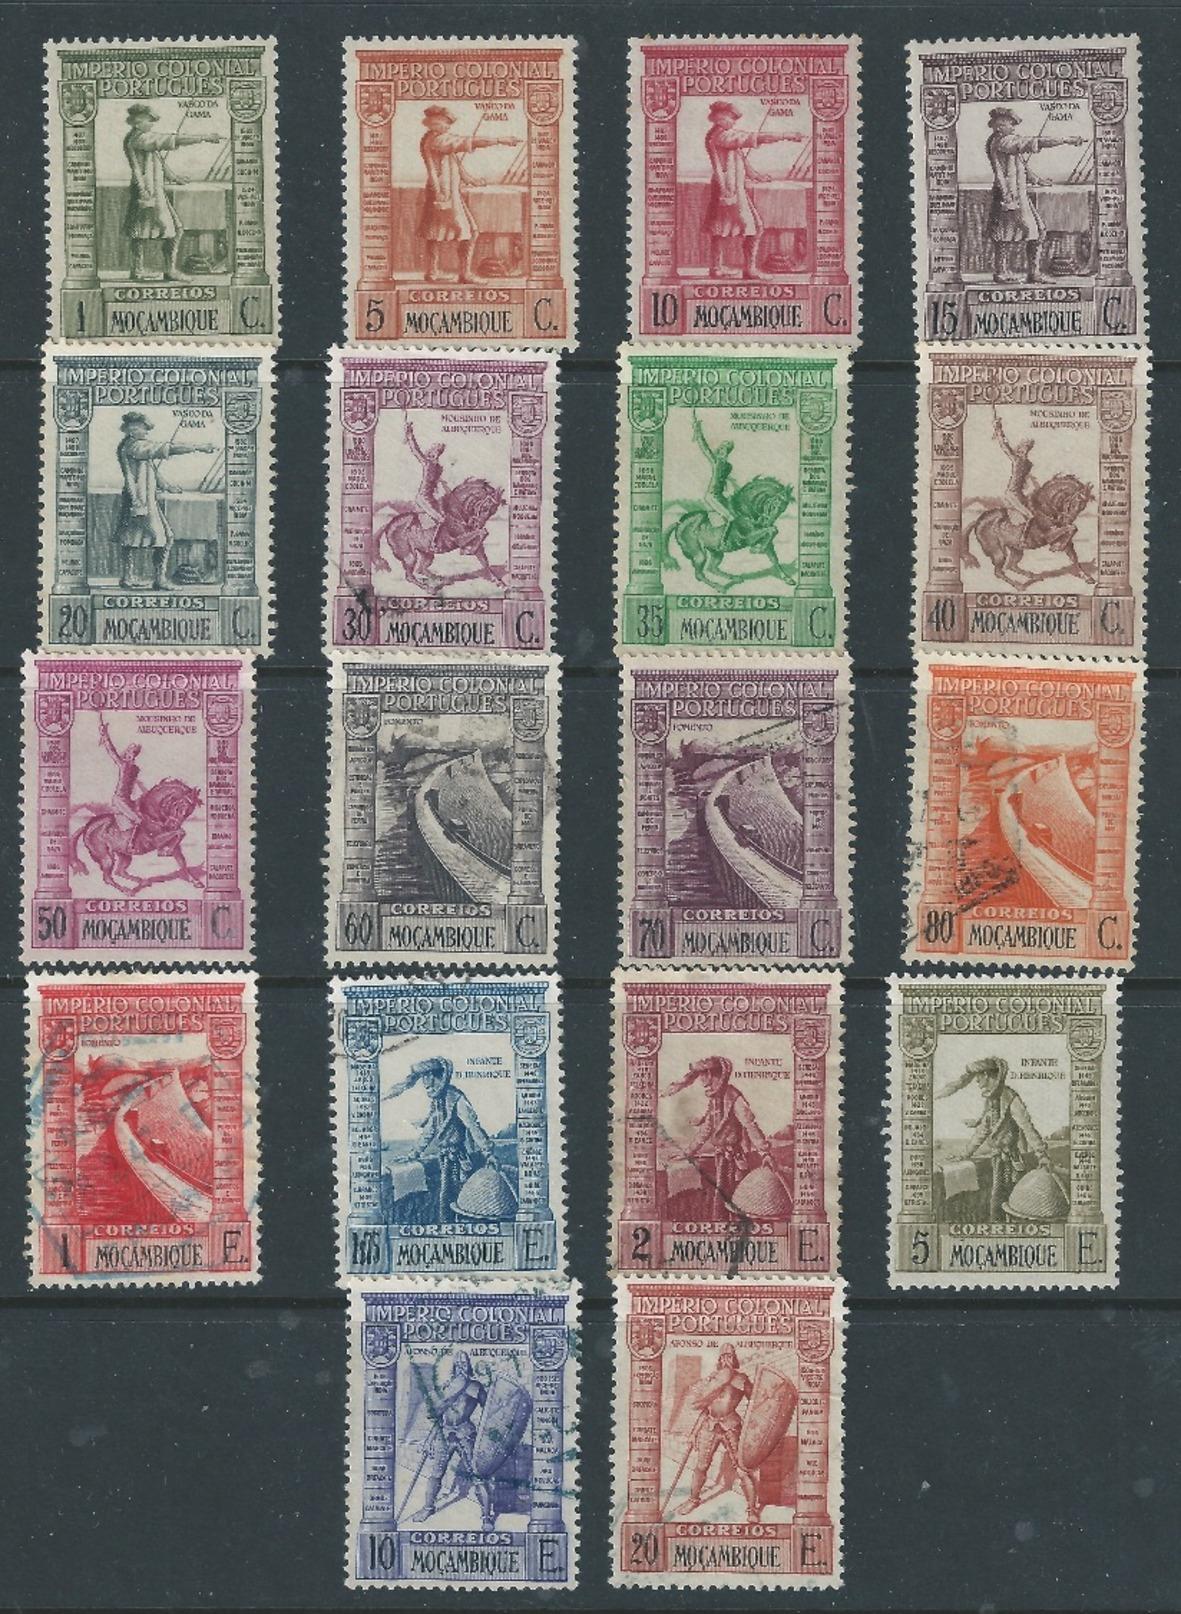 PORTUGESE COLONIES MOZAMBIQUE 1938 VASCO DA GAMA POSTAGE SET TO 20E SG351/68 MNH/Used - Mozambique